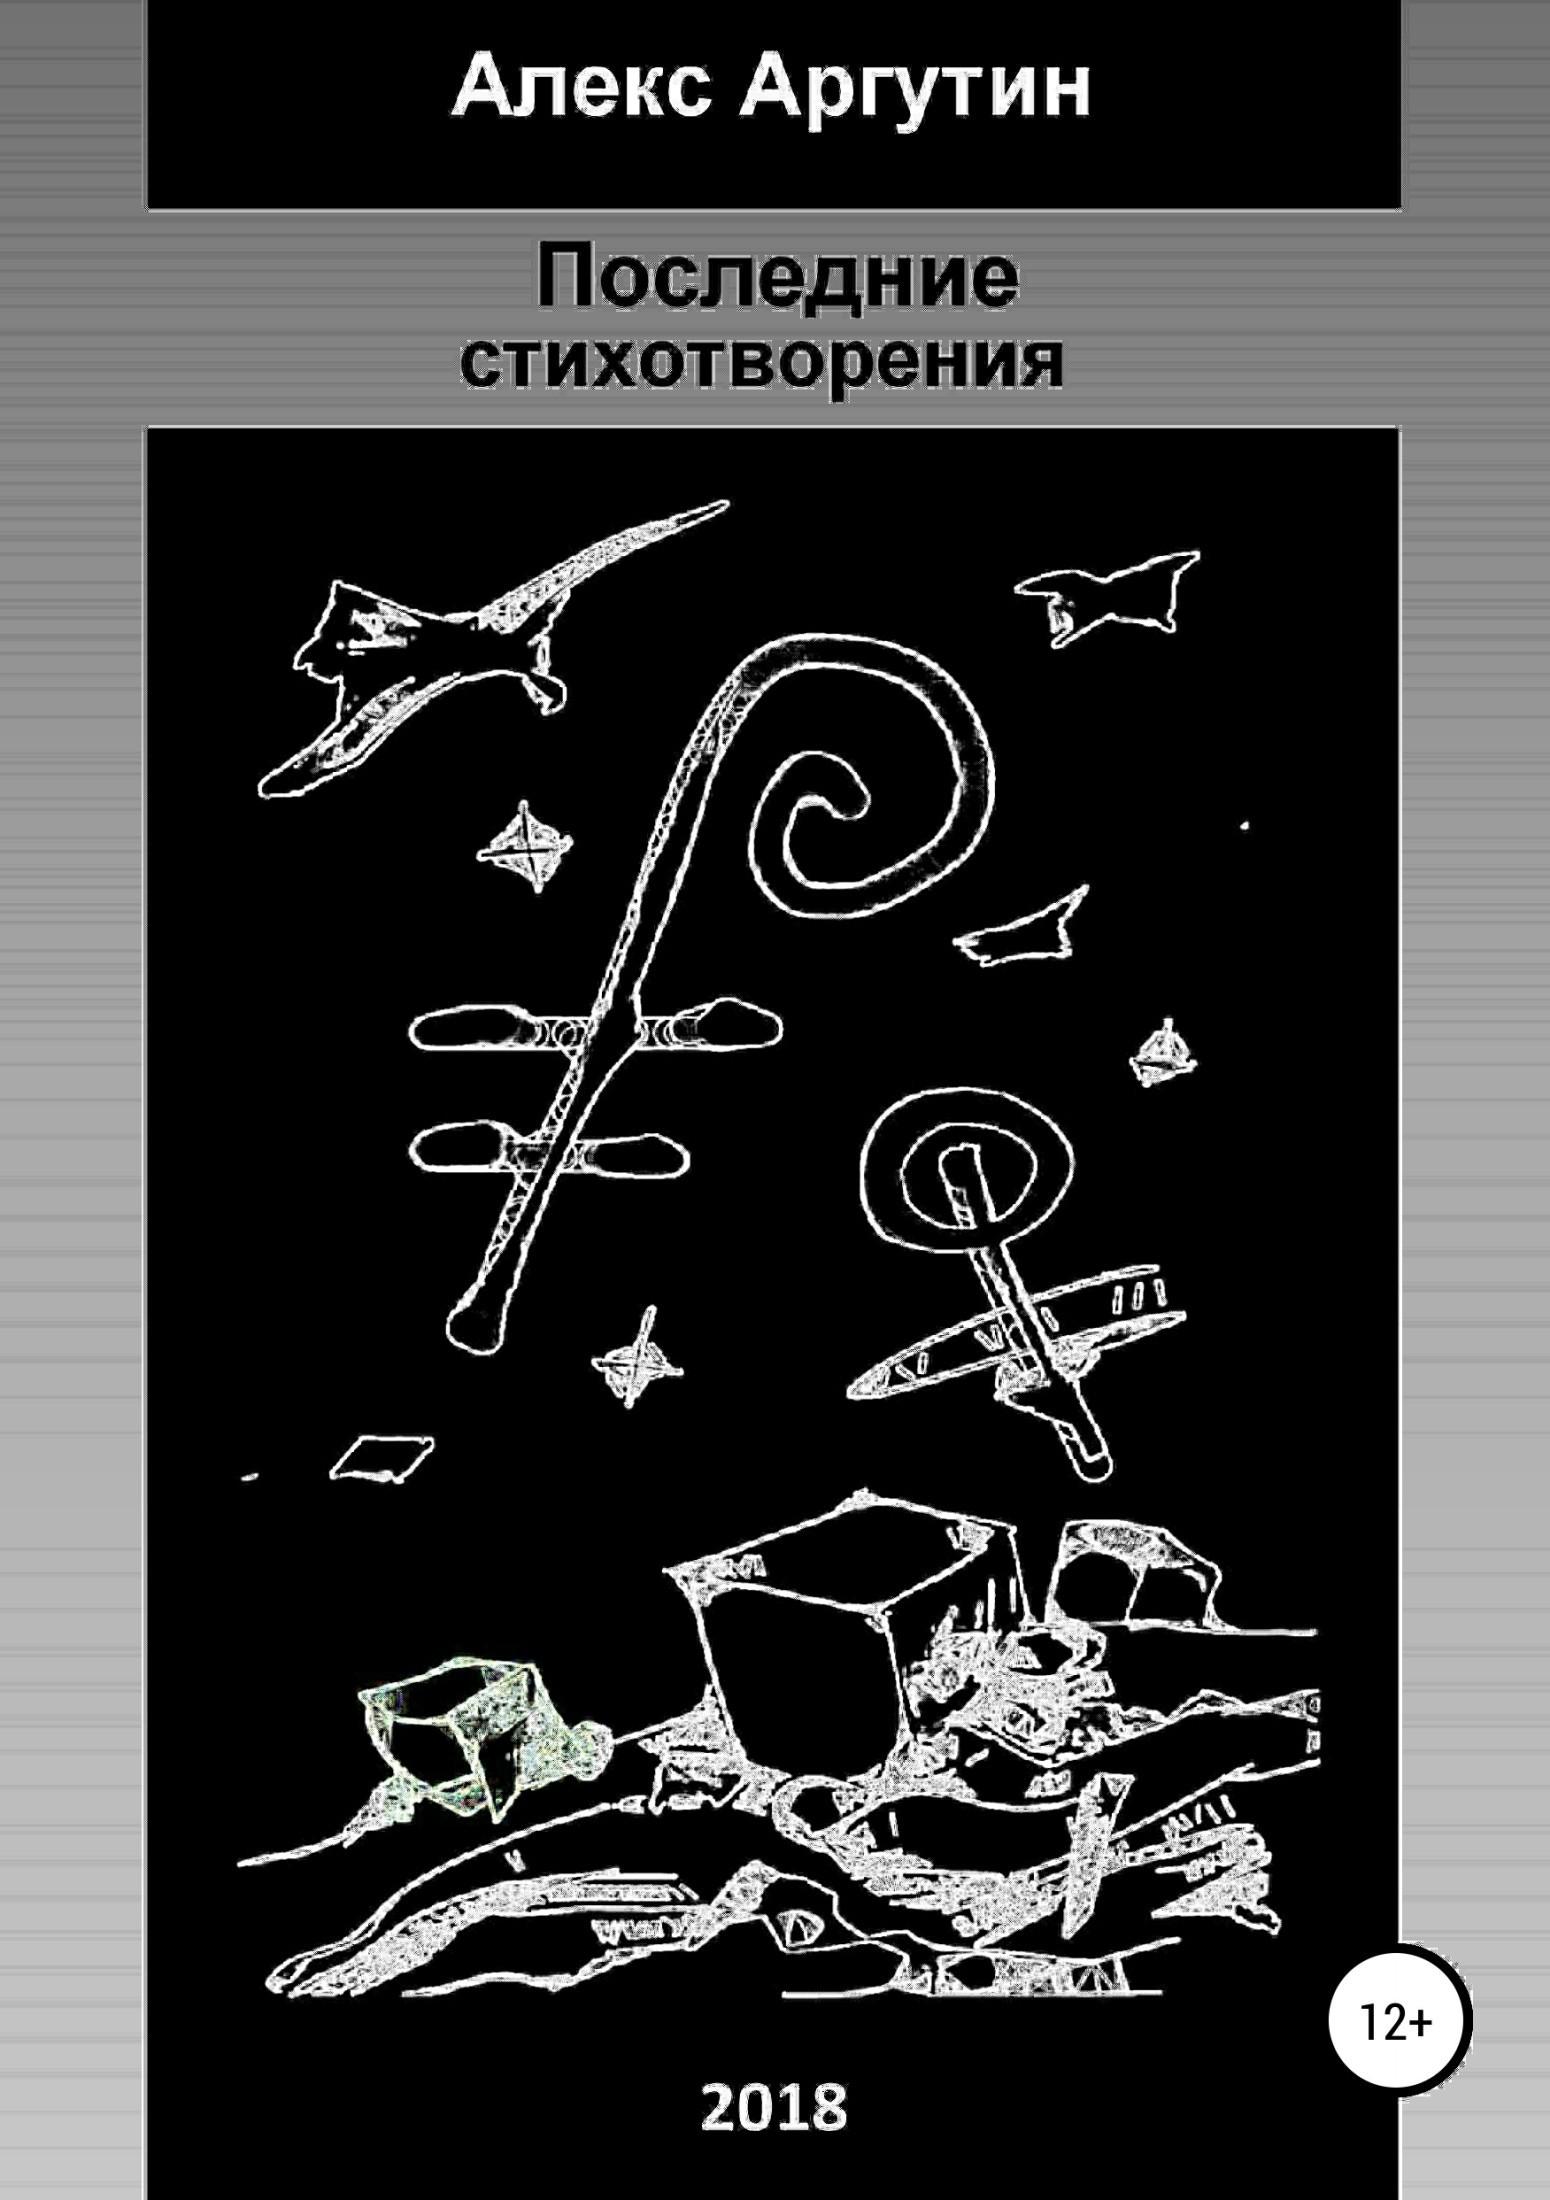 Алекс Аргутин Последние стихотворения